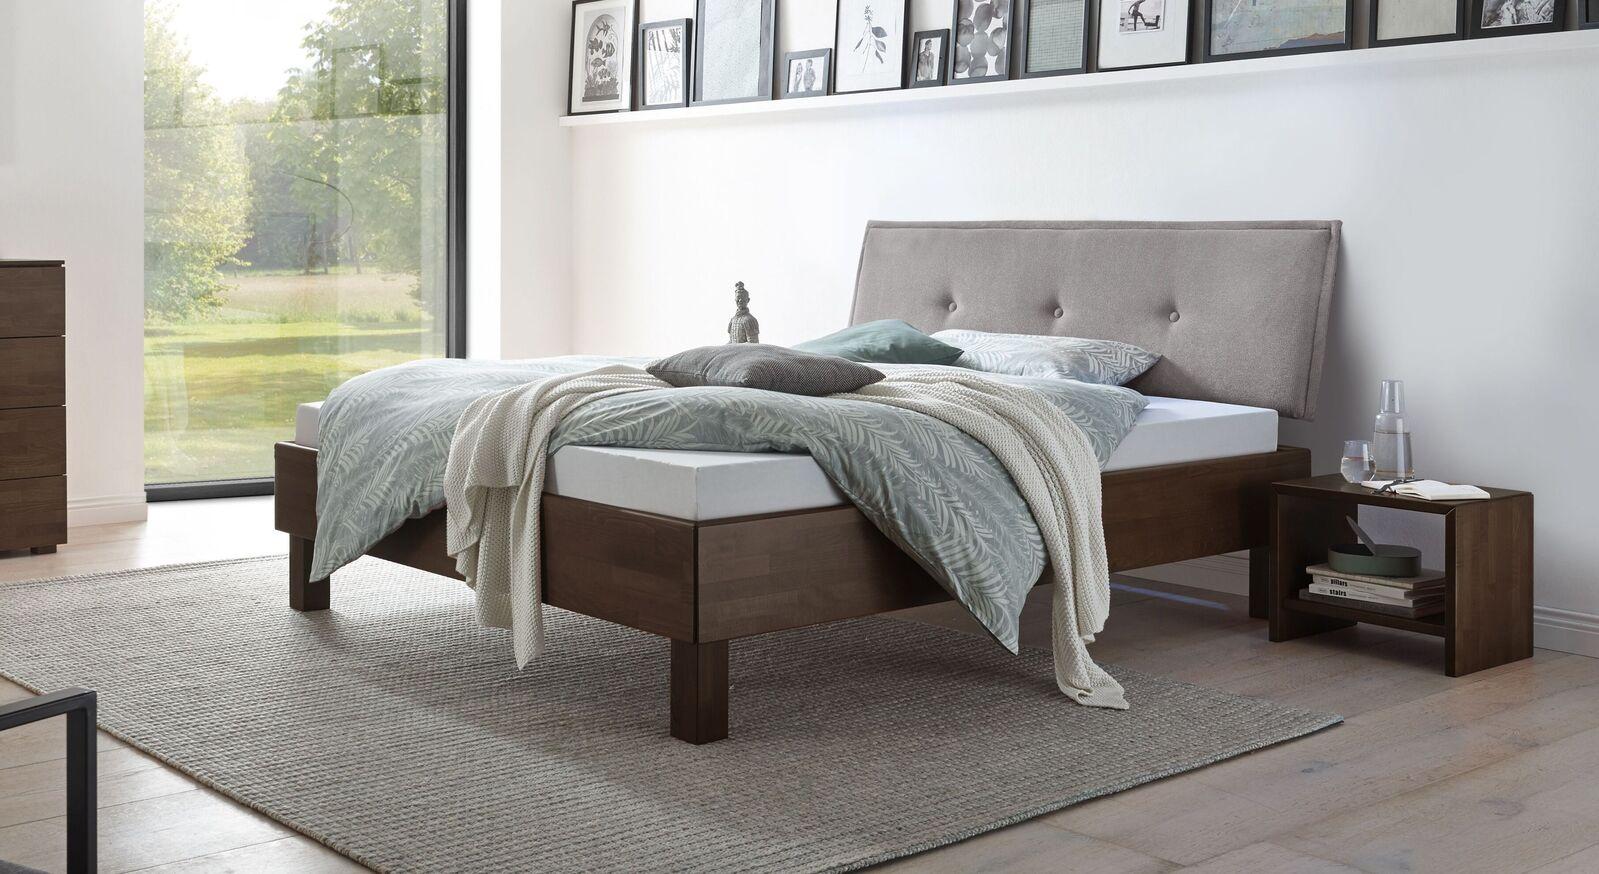 Bett Fenzlo aus wengefarbenem Buchenholz